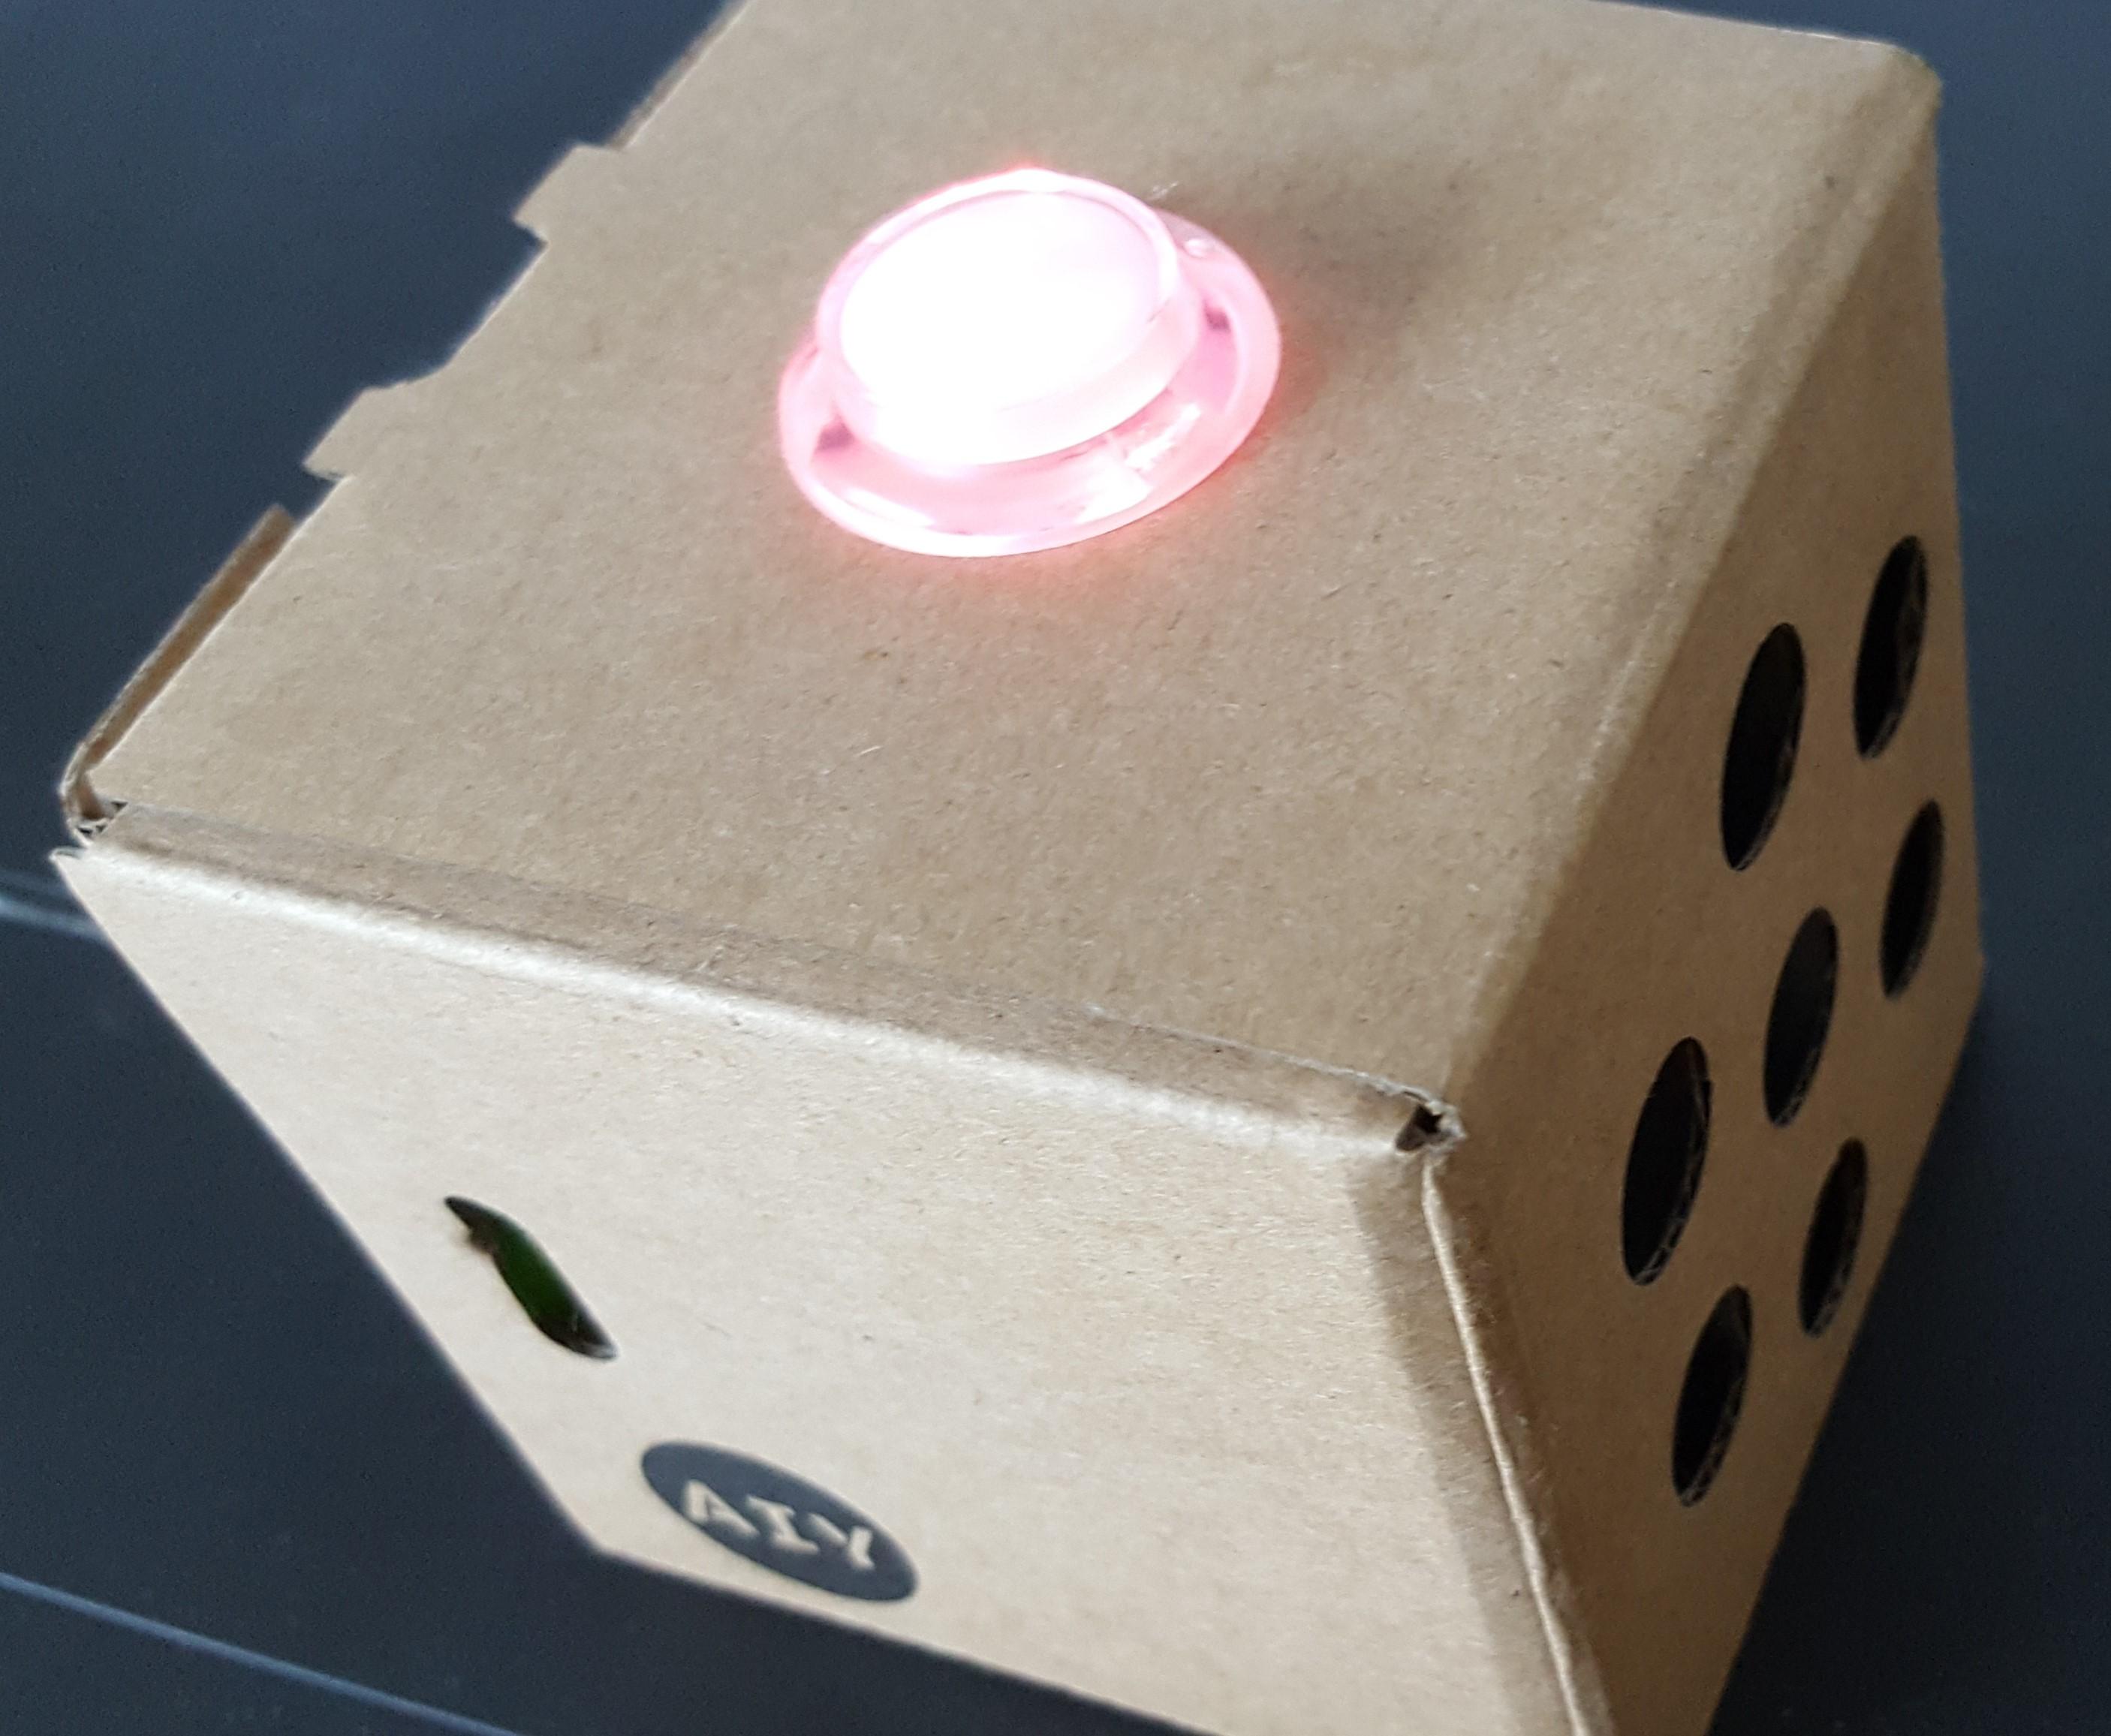 Google AIY Voice Kit Assembled